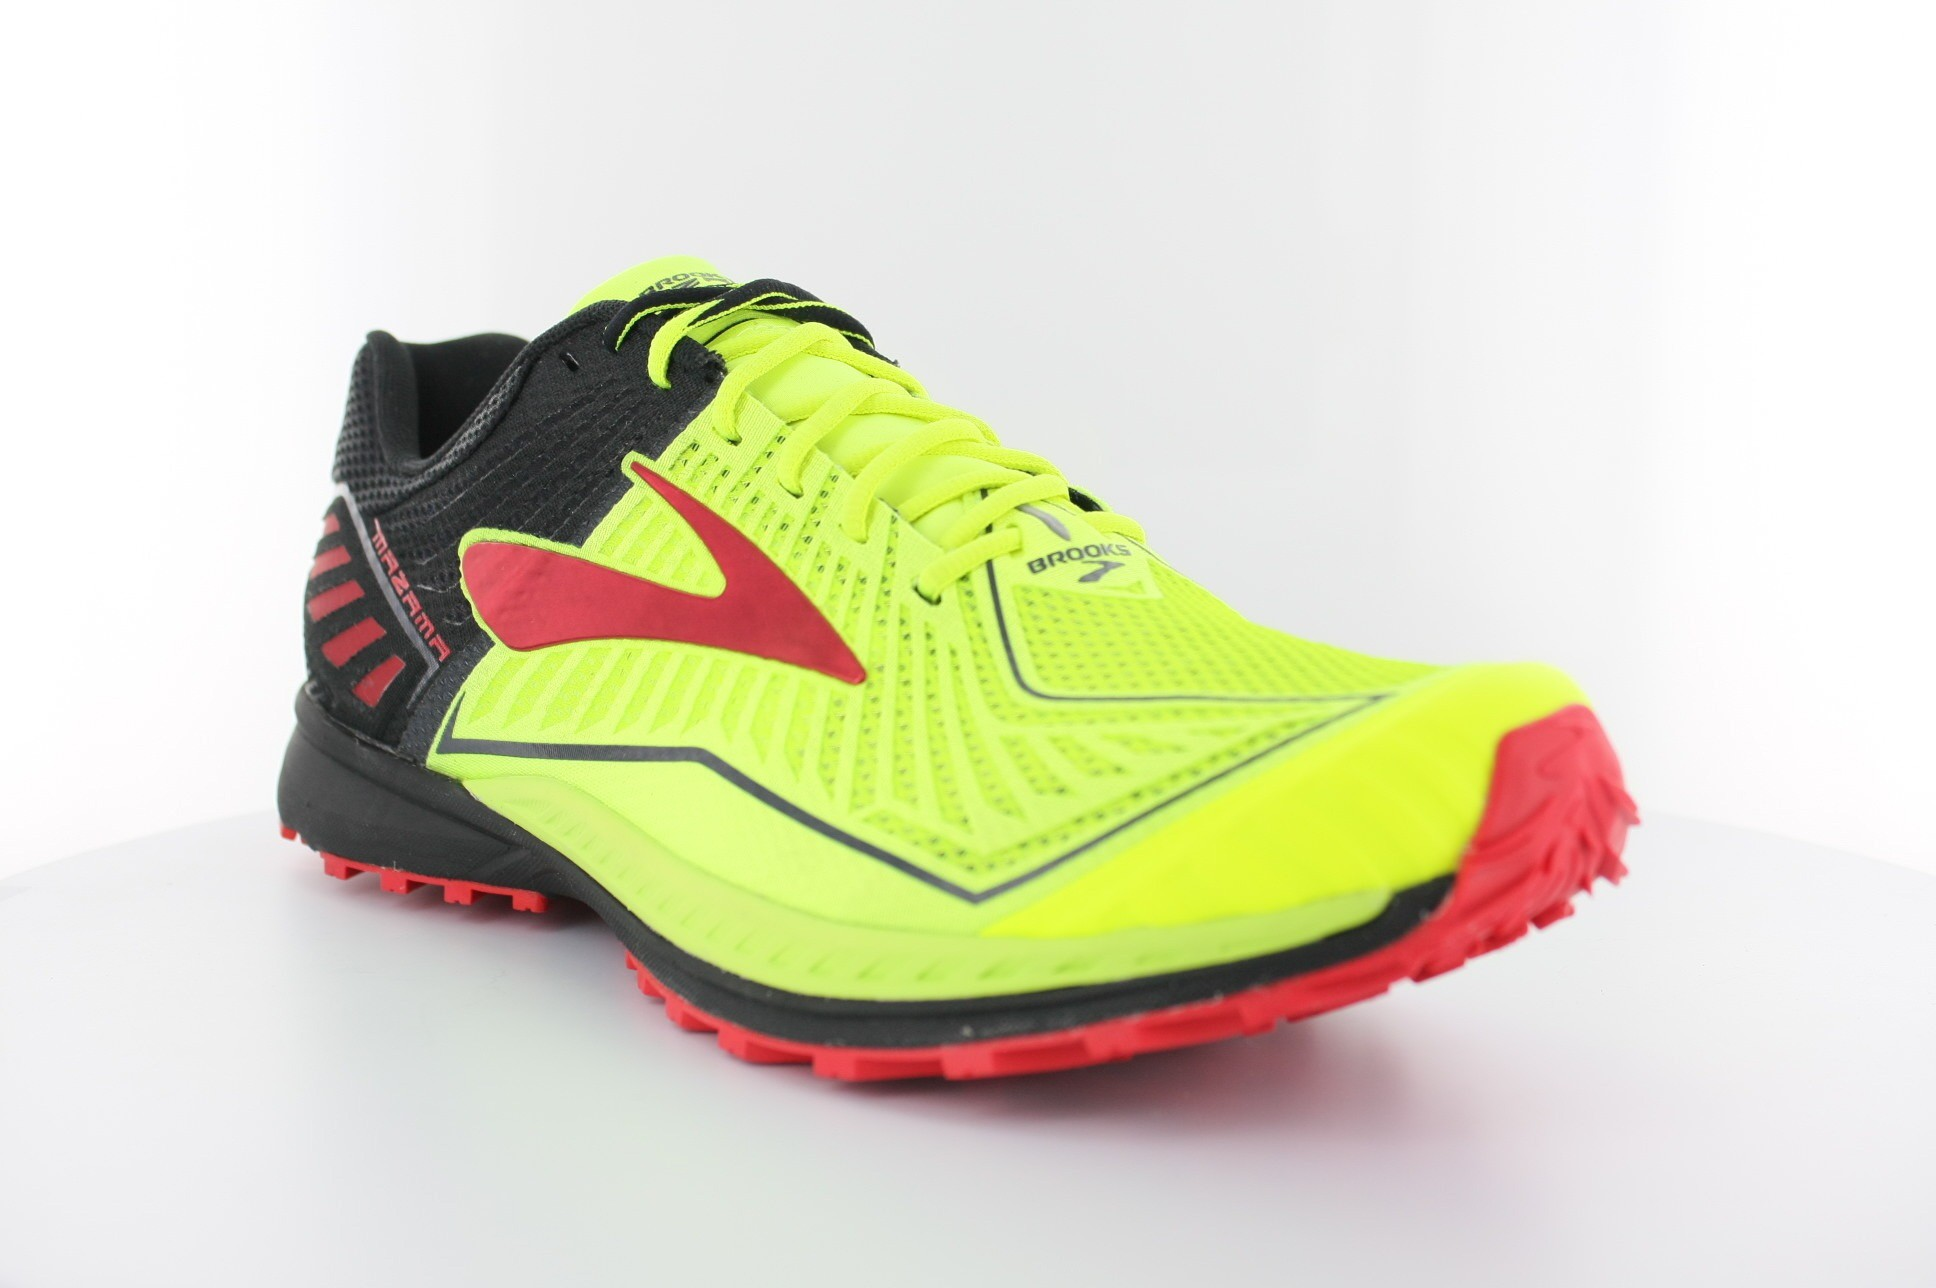 Brooks Mazama Shoe Review | Kintec